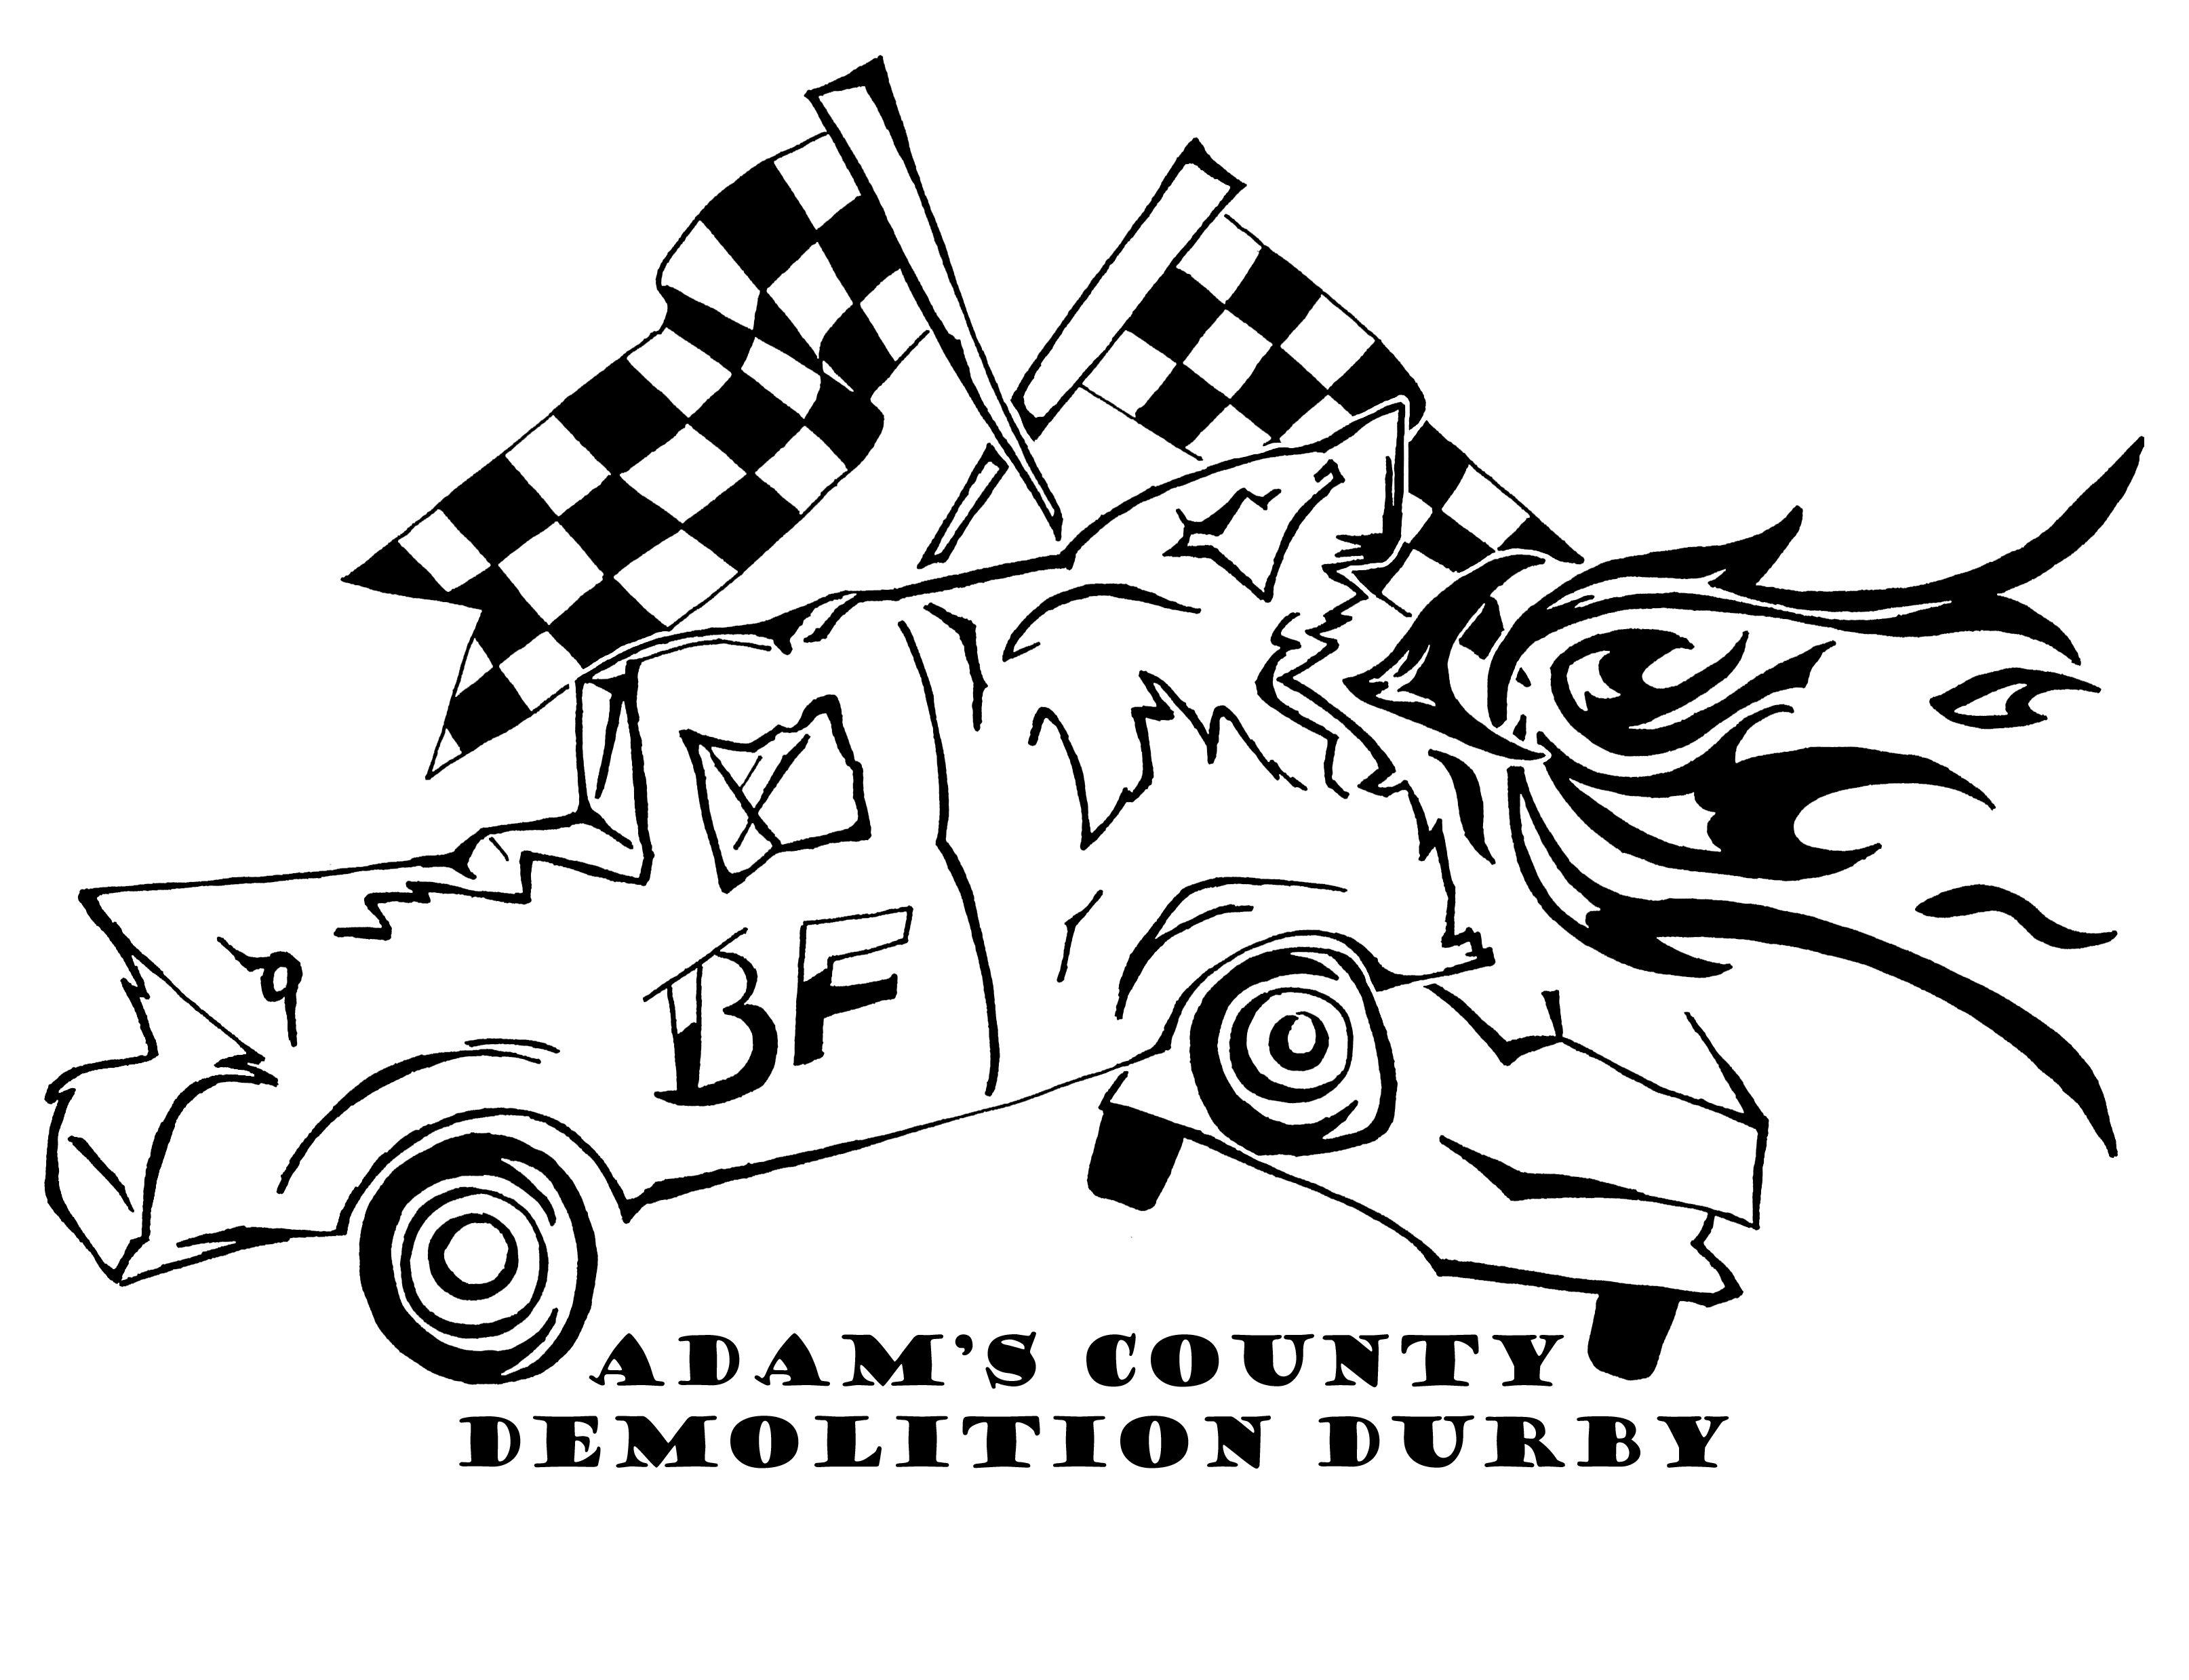 3228x2478 Demo Derby Logo By Rachel Kallenbach Drawings Pencil And Pen